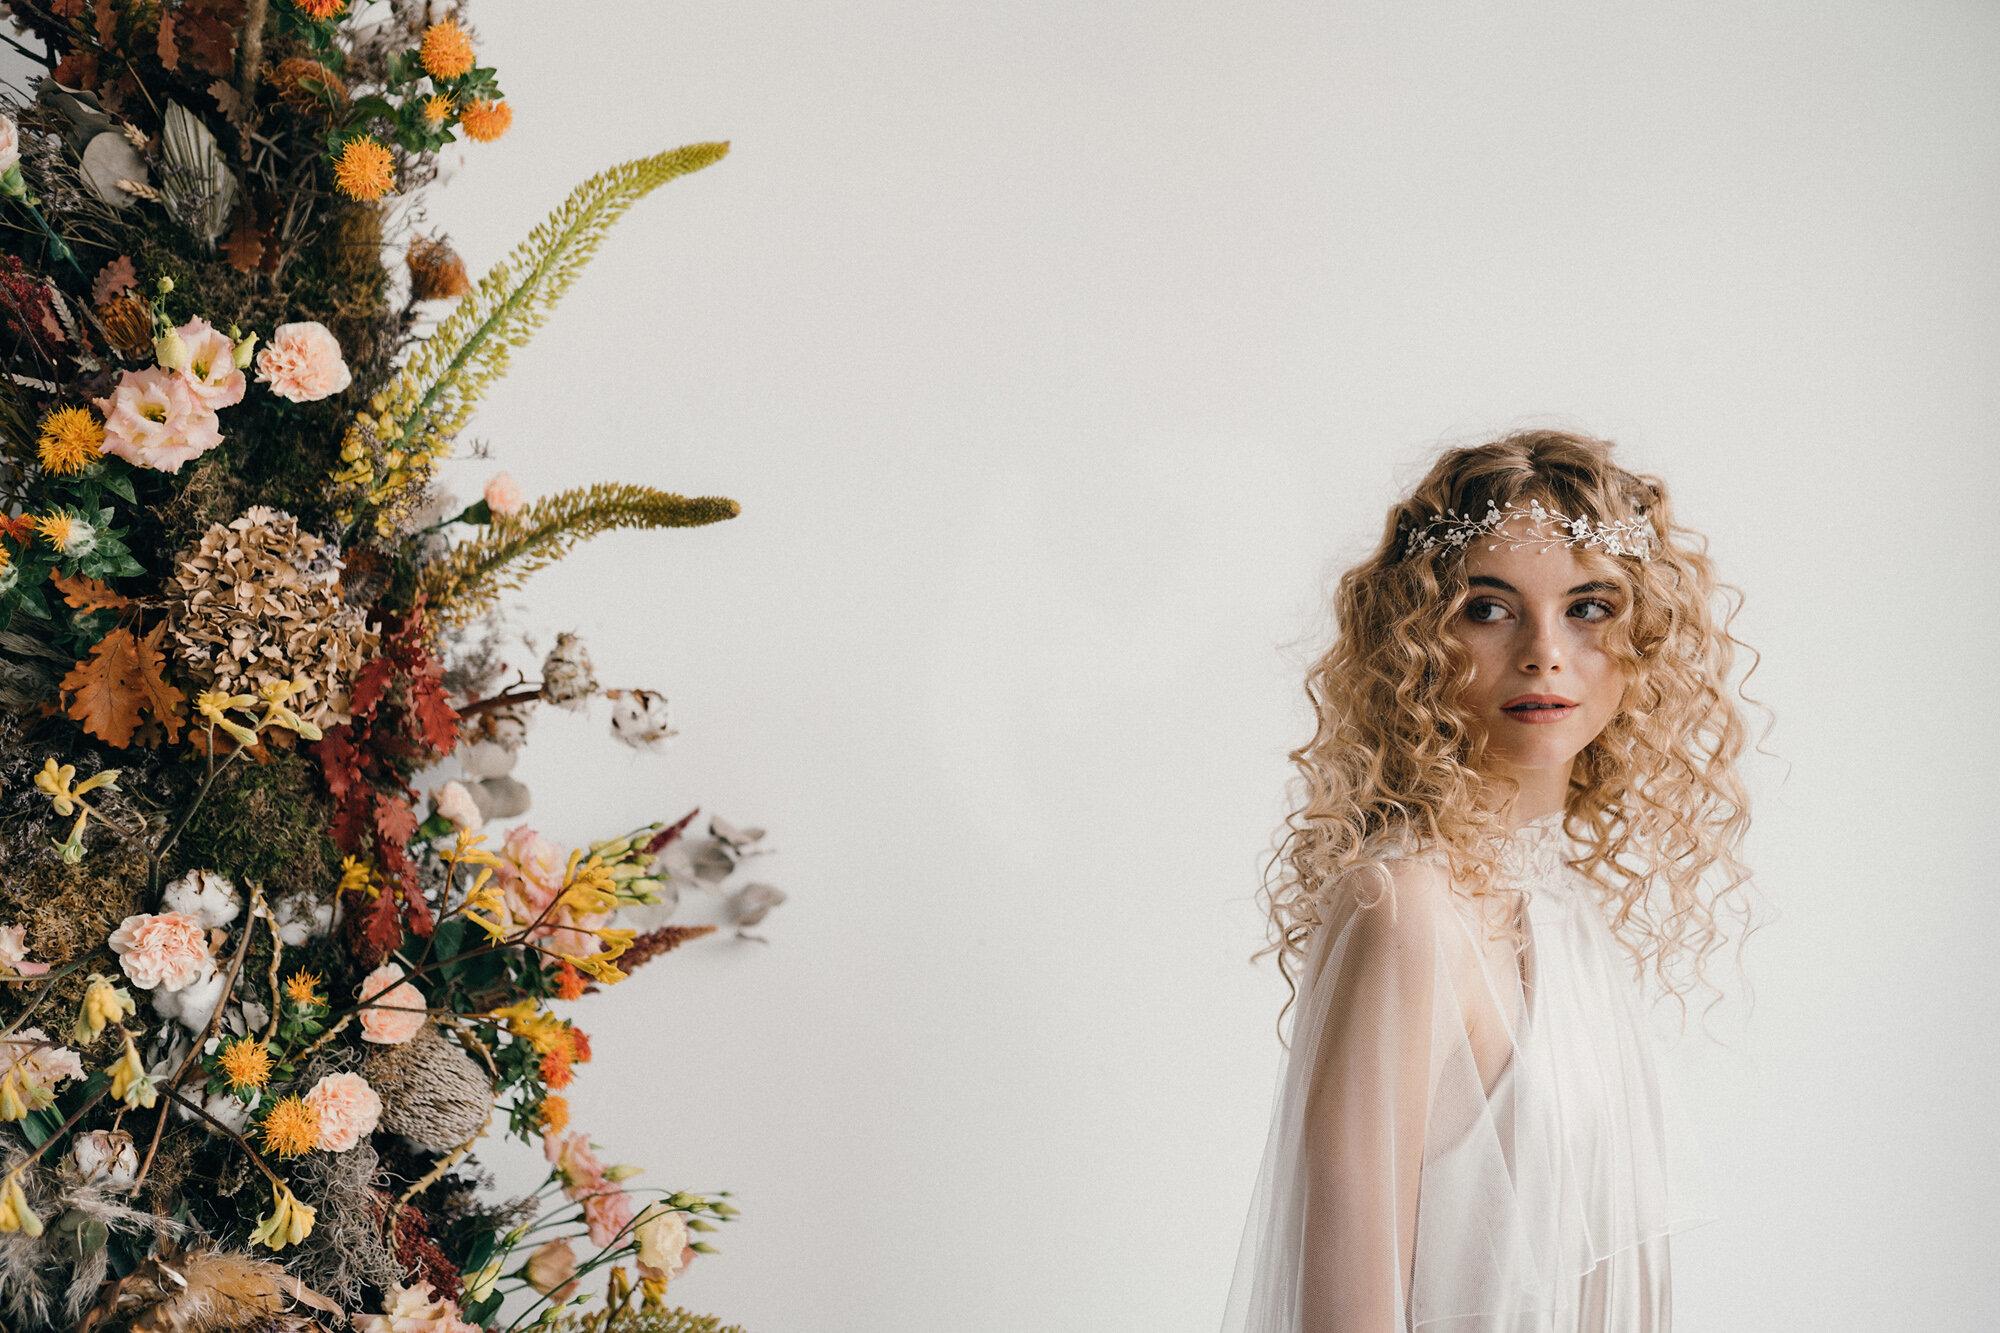 Debbie-Carlisle-Bridal-Accessories-Kate-Beaumont-Wedding-Gowns-Sheffield-Yorkshire-UK-16.jpg